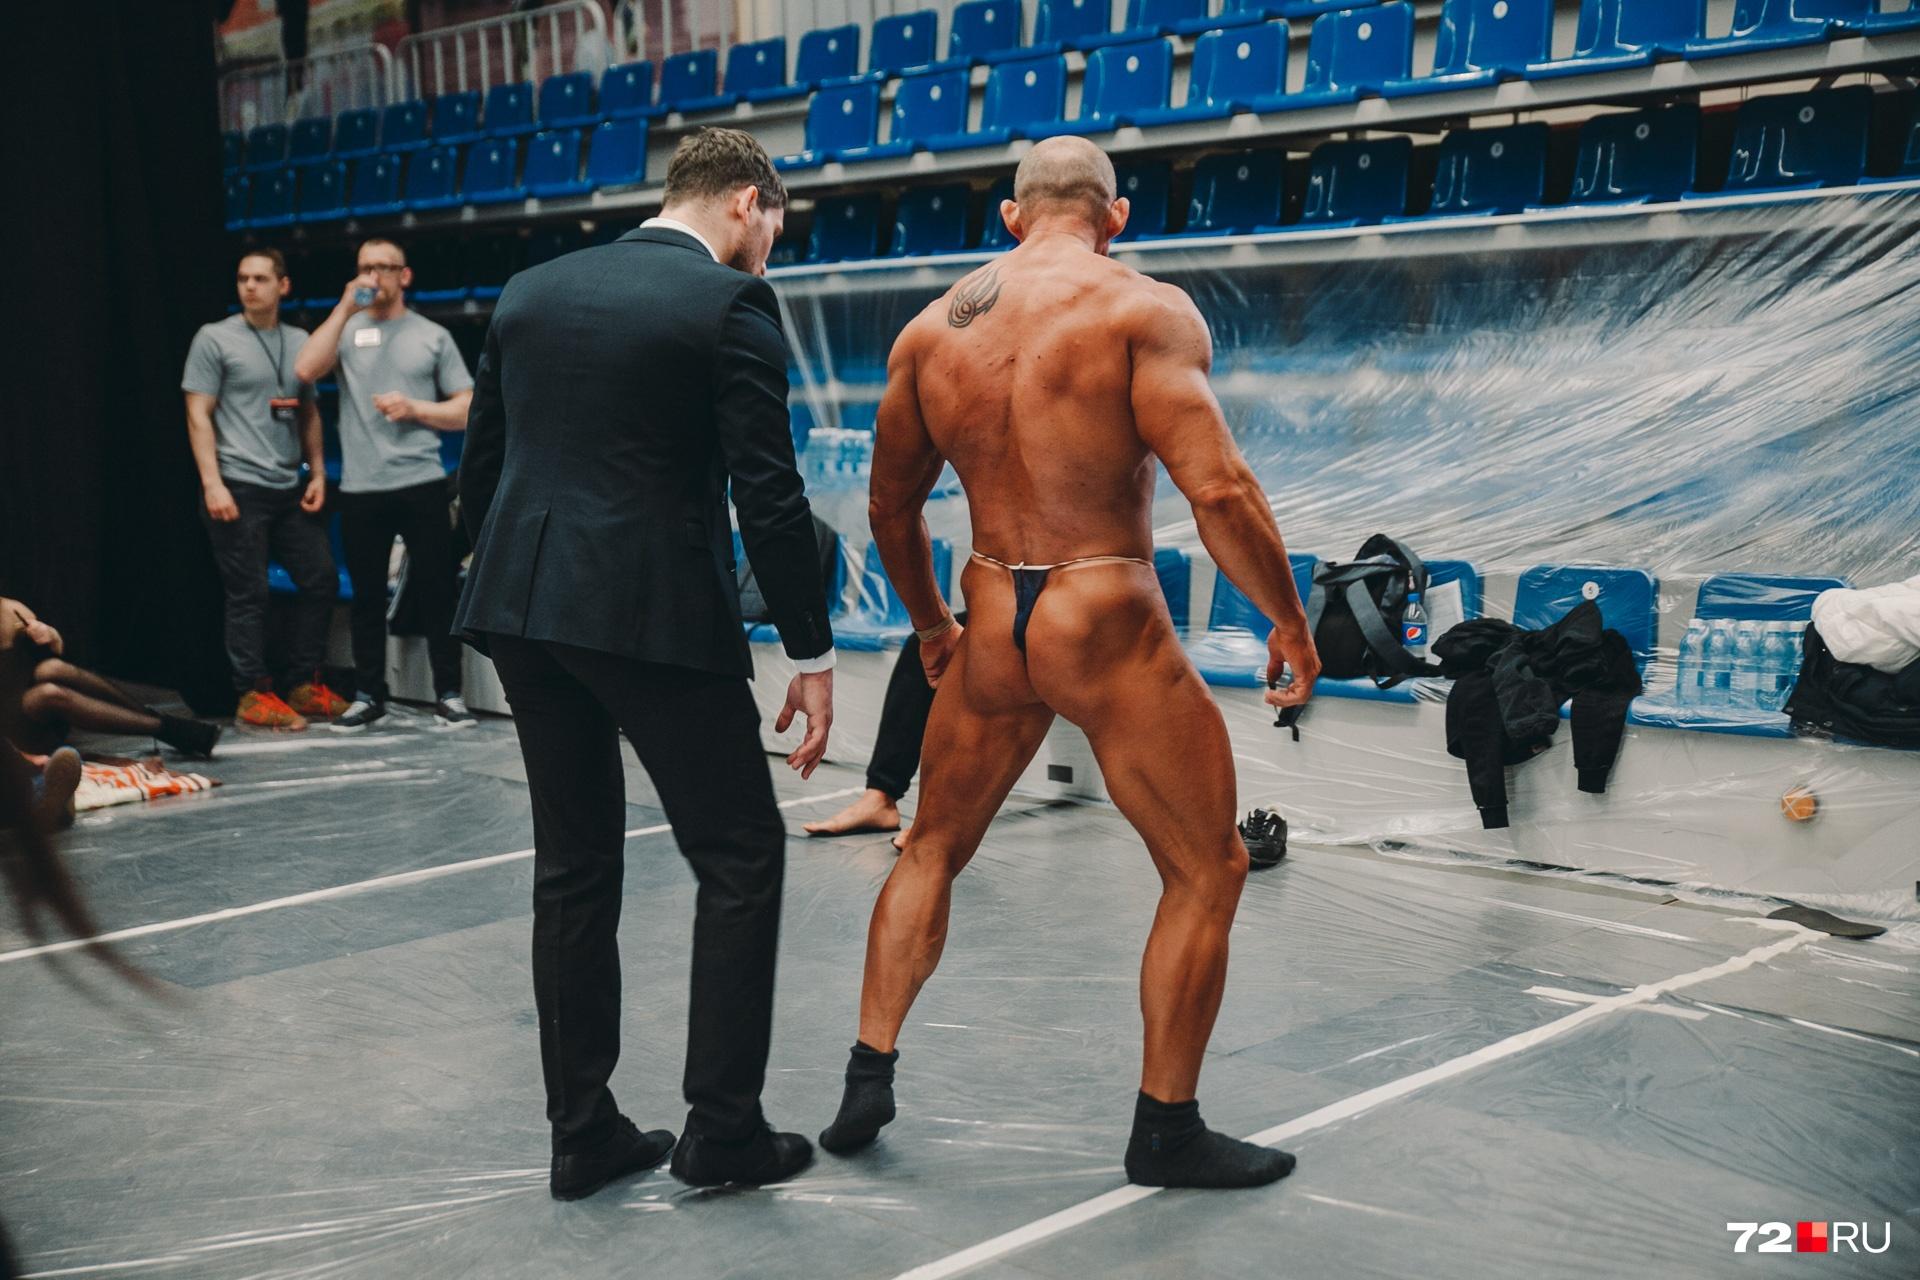 Александр представлял на соревнованиях город Надым